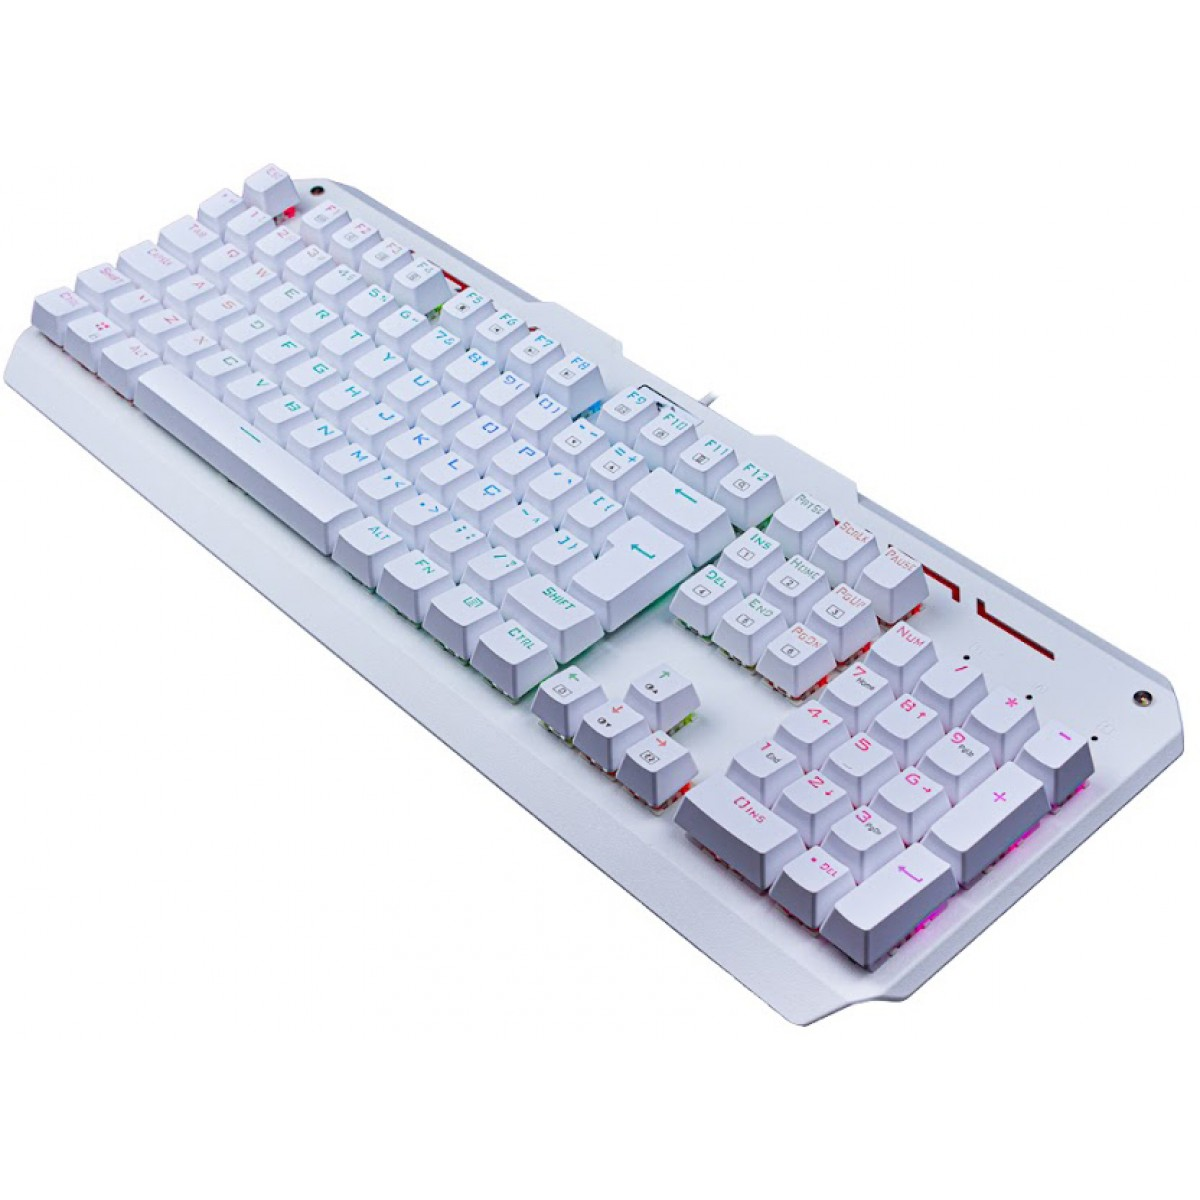 Teclado Mecânico Gamer Redragon Varuna Lunar K559W RGB, Switch Brown, ABNT2, White